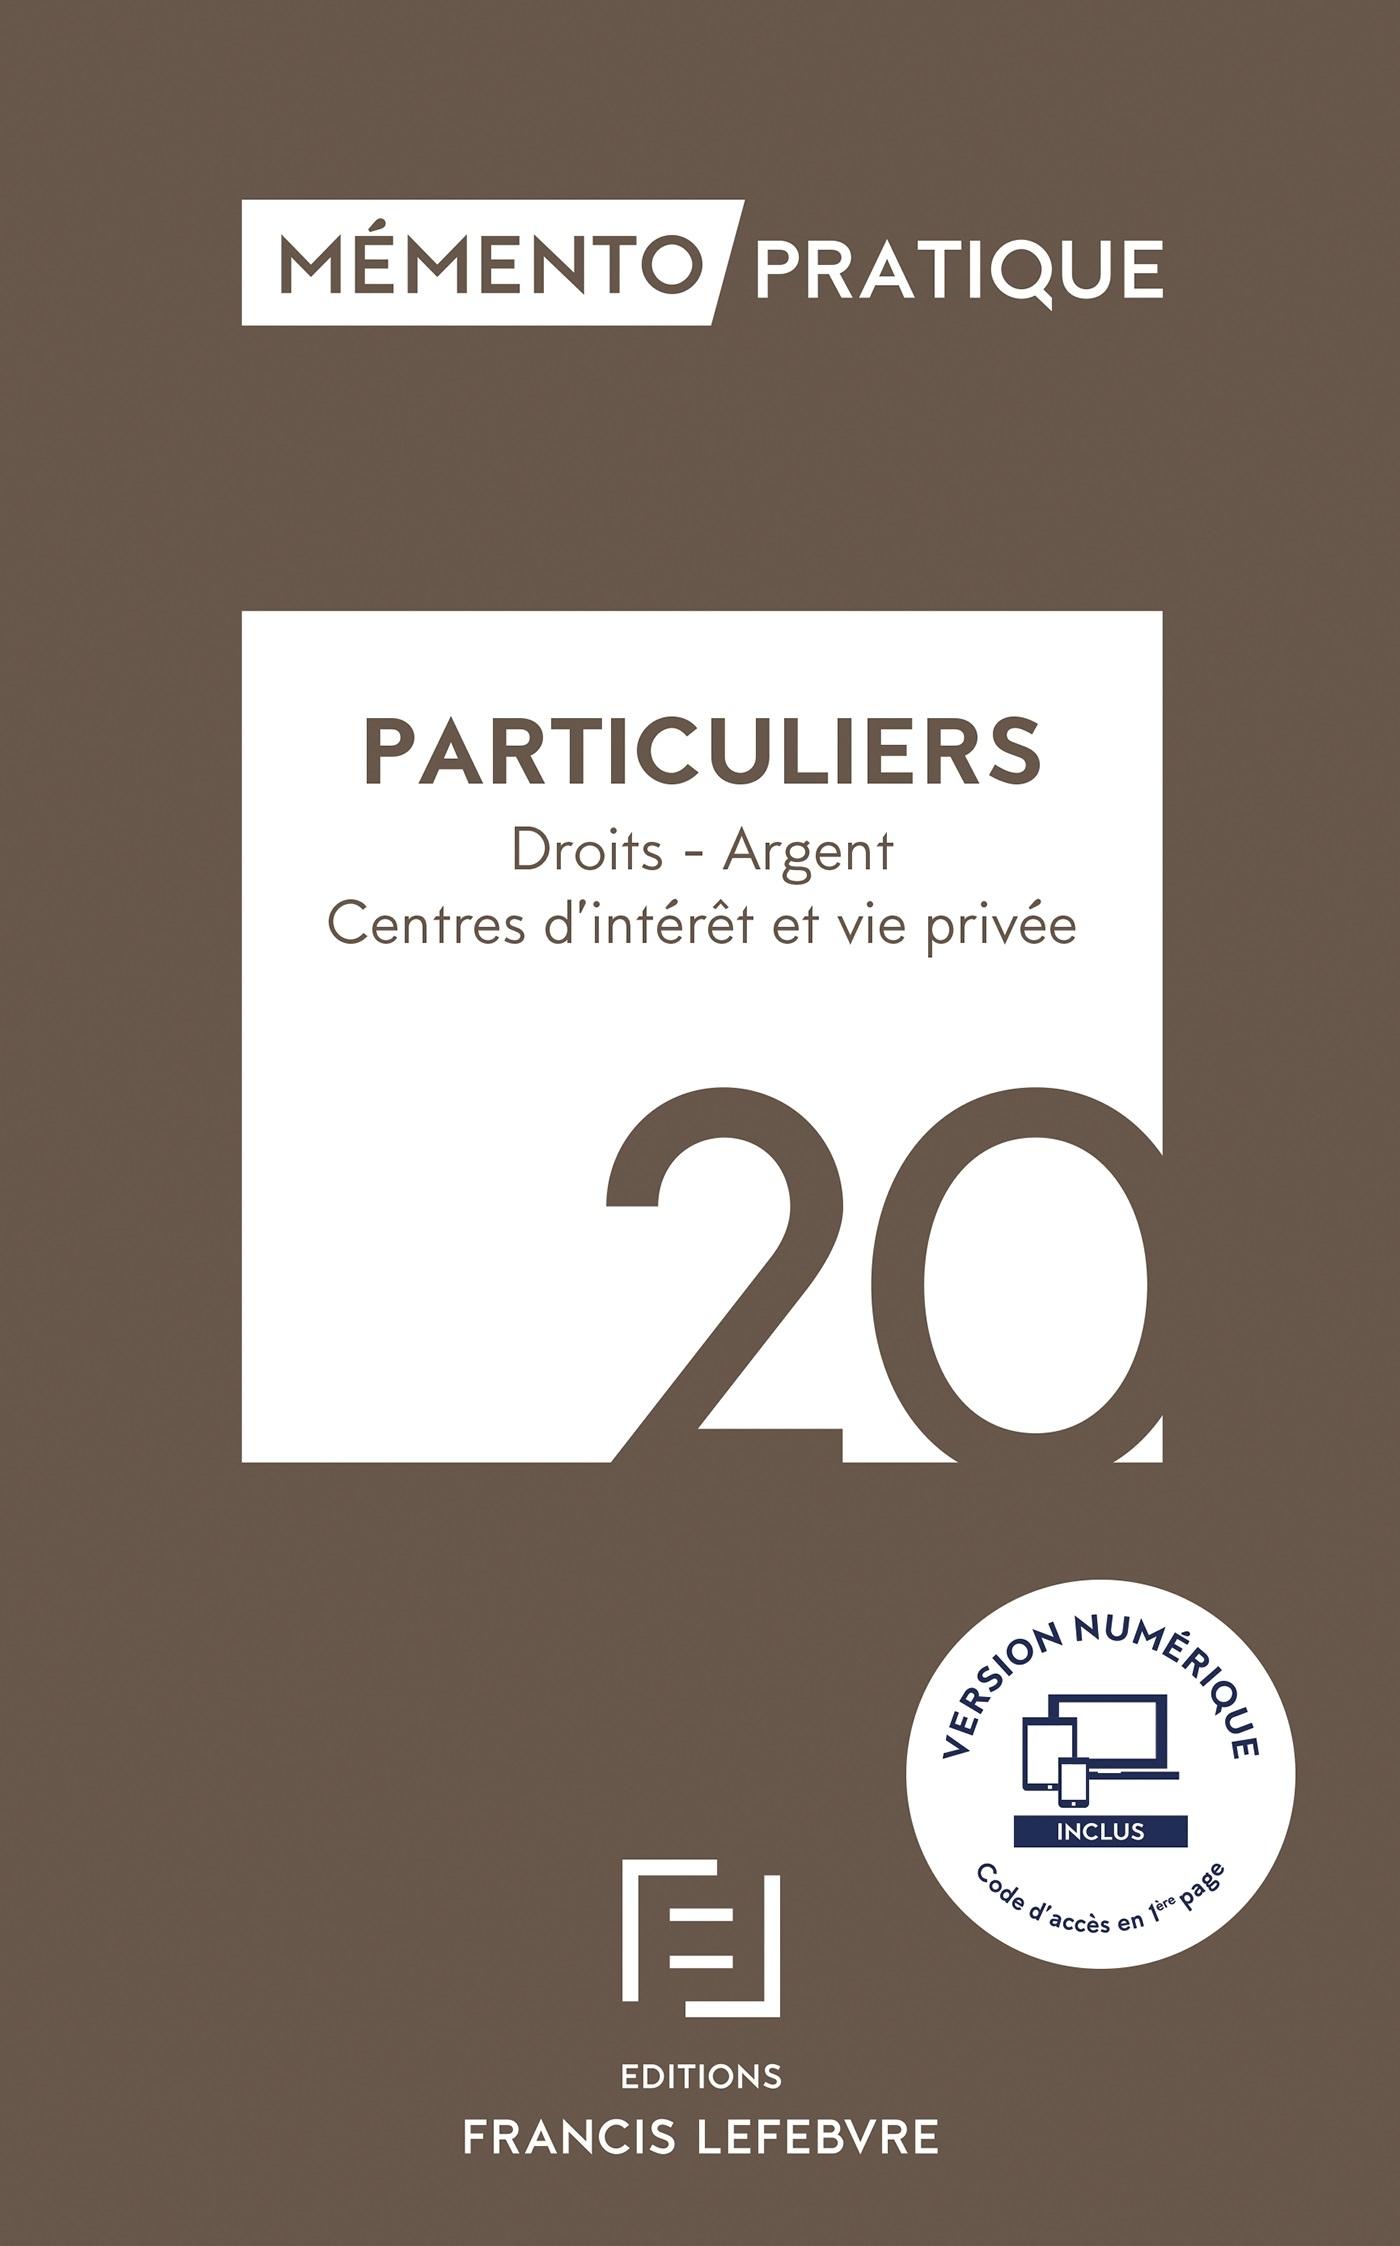 MEMENTO PARTICULIERS 2020